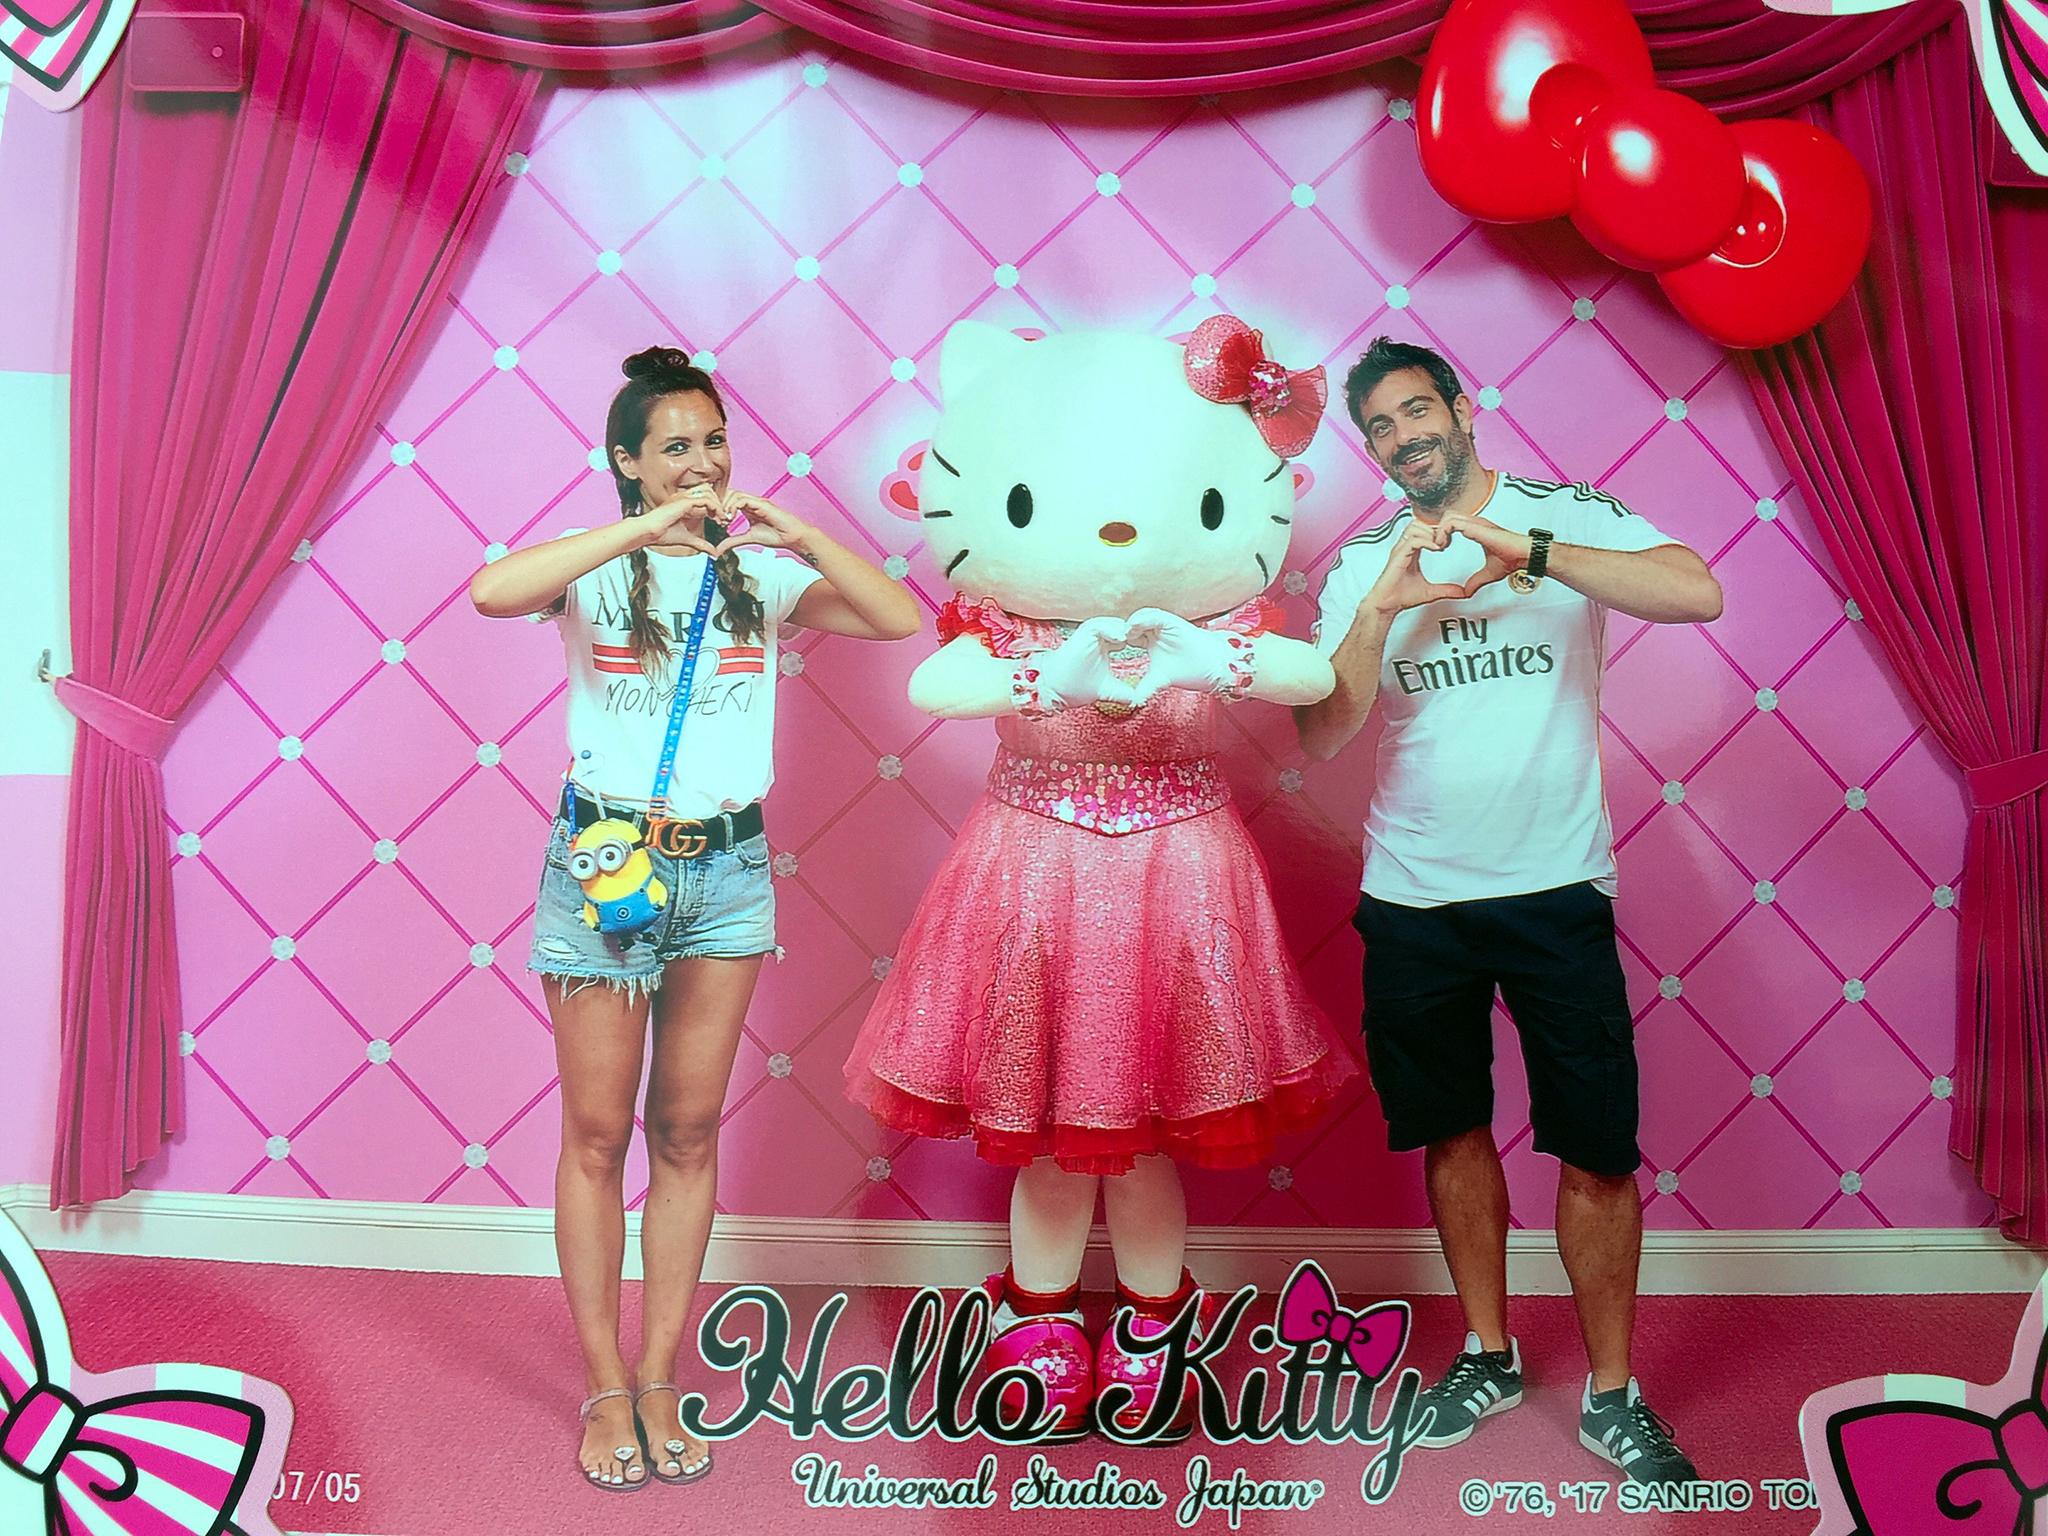 Universal Studios Osaka - Hello Kitty - Viajar a Japón - ruta por Japón en dos semanas ruta por japón en dos semanas - 36507659260 7a4a6f9c62 o - Nuestra Ruta por Japón en dos semanas (Diario de Viaje a Japón)